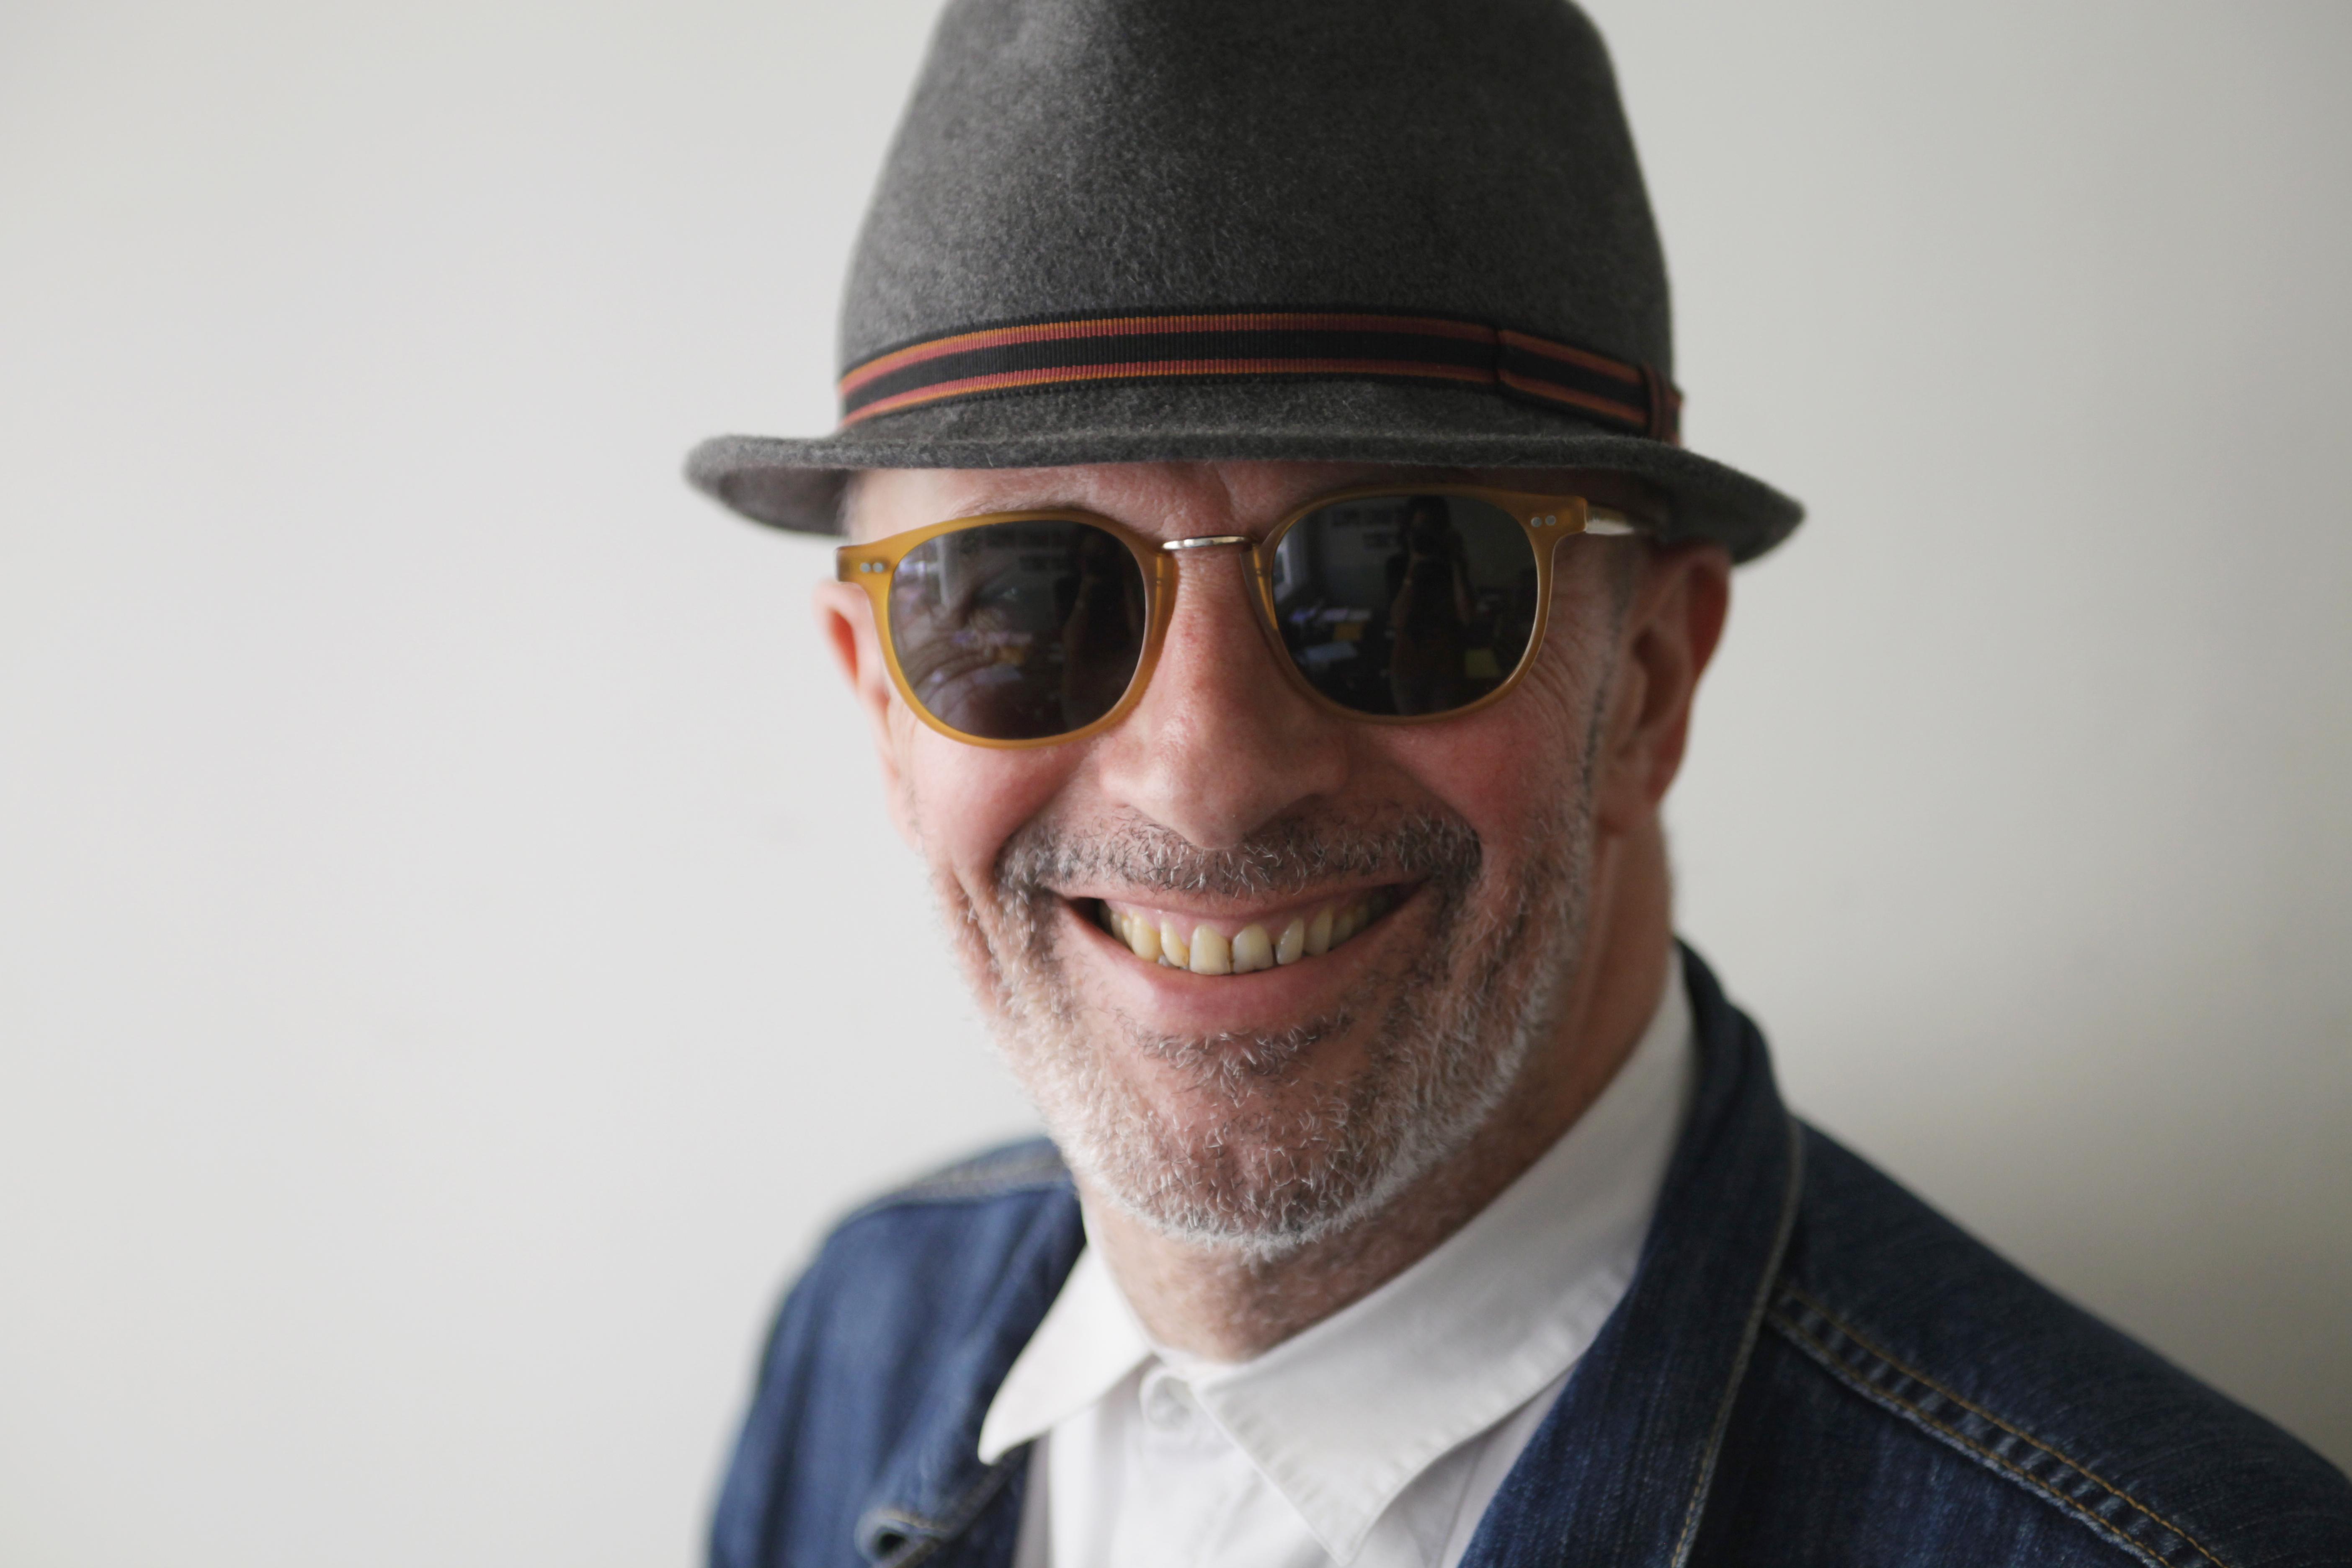 Jacques Audiard in Dheepan (2015)